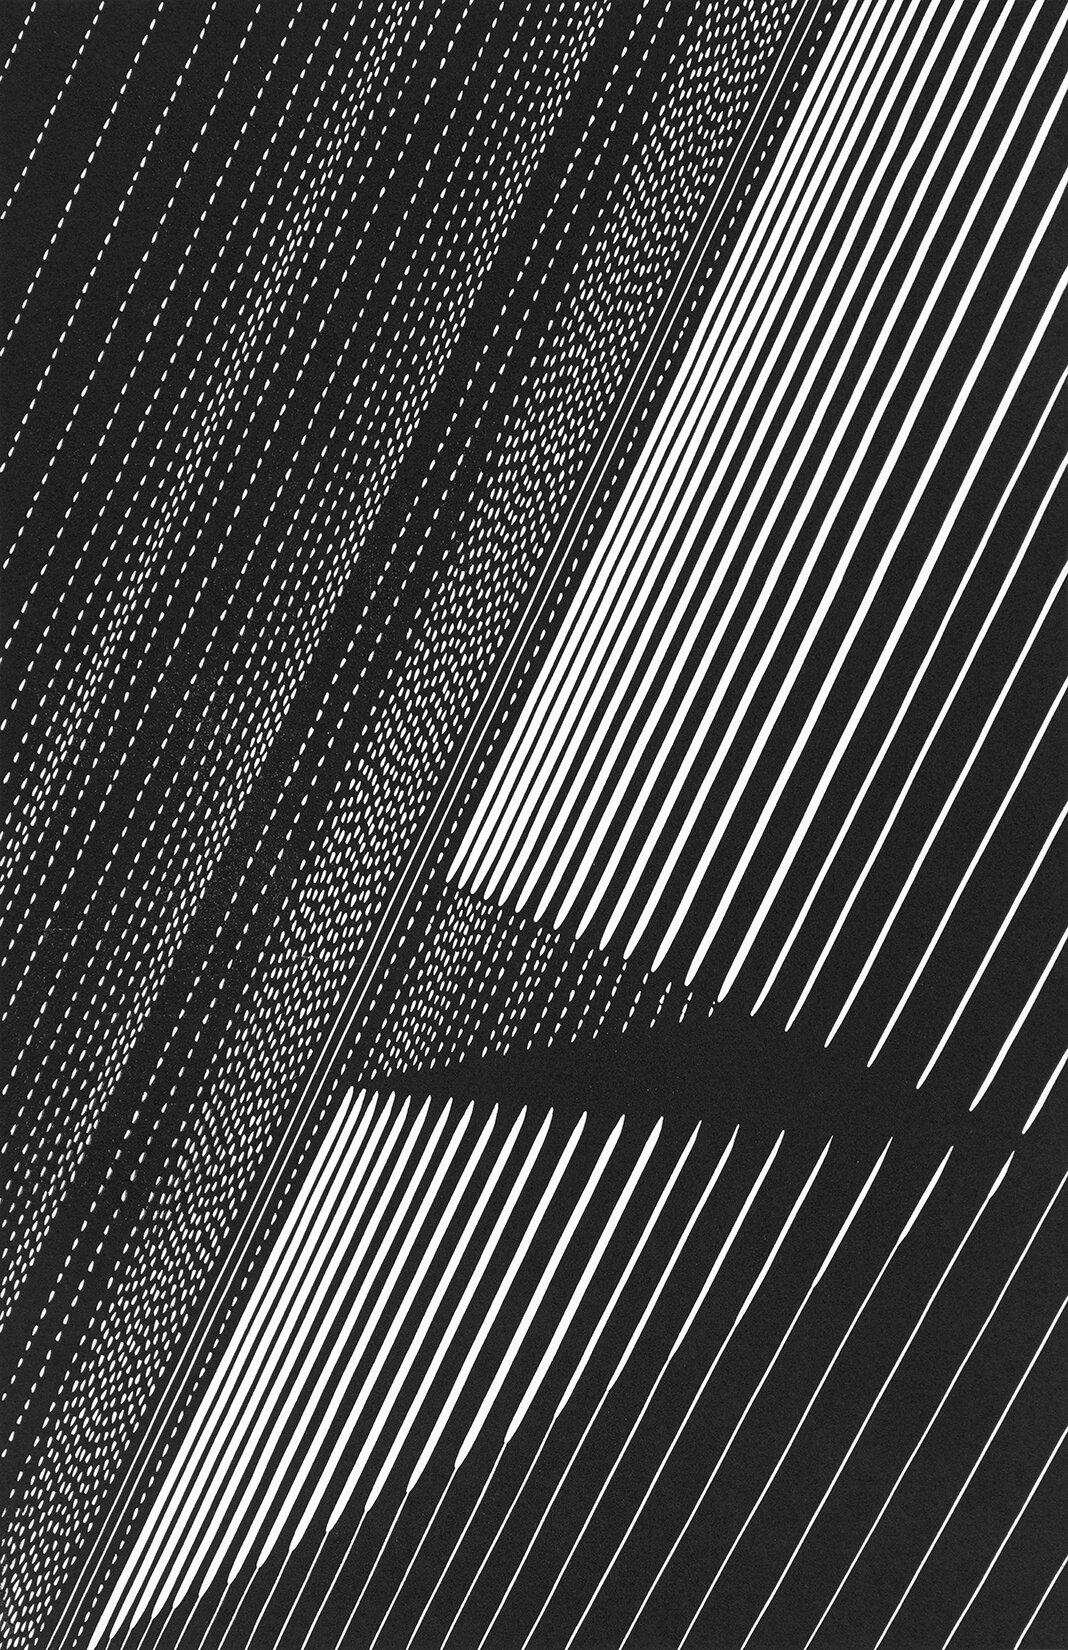 Chasing Shadow Precipice Kari Kristensen.jpg